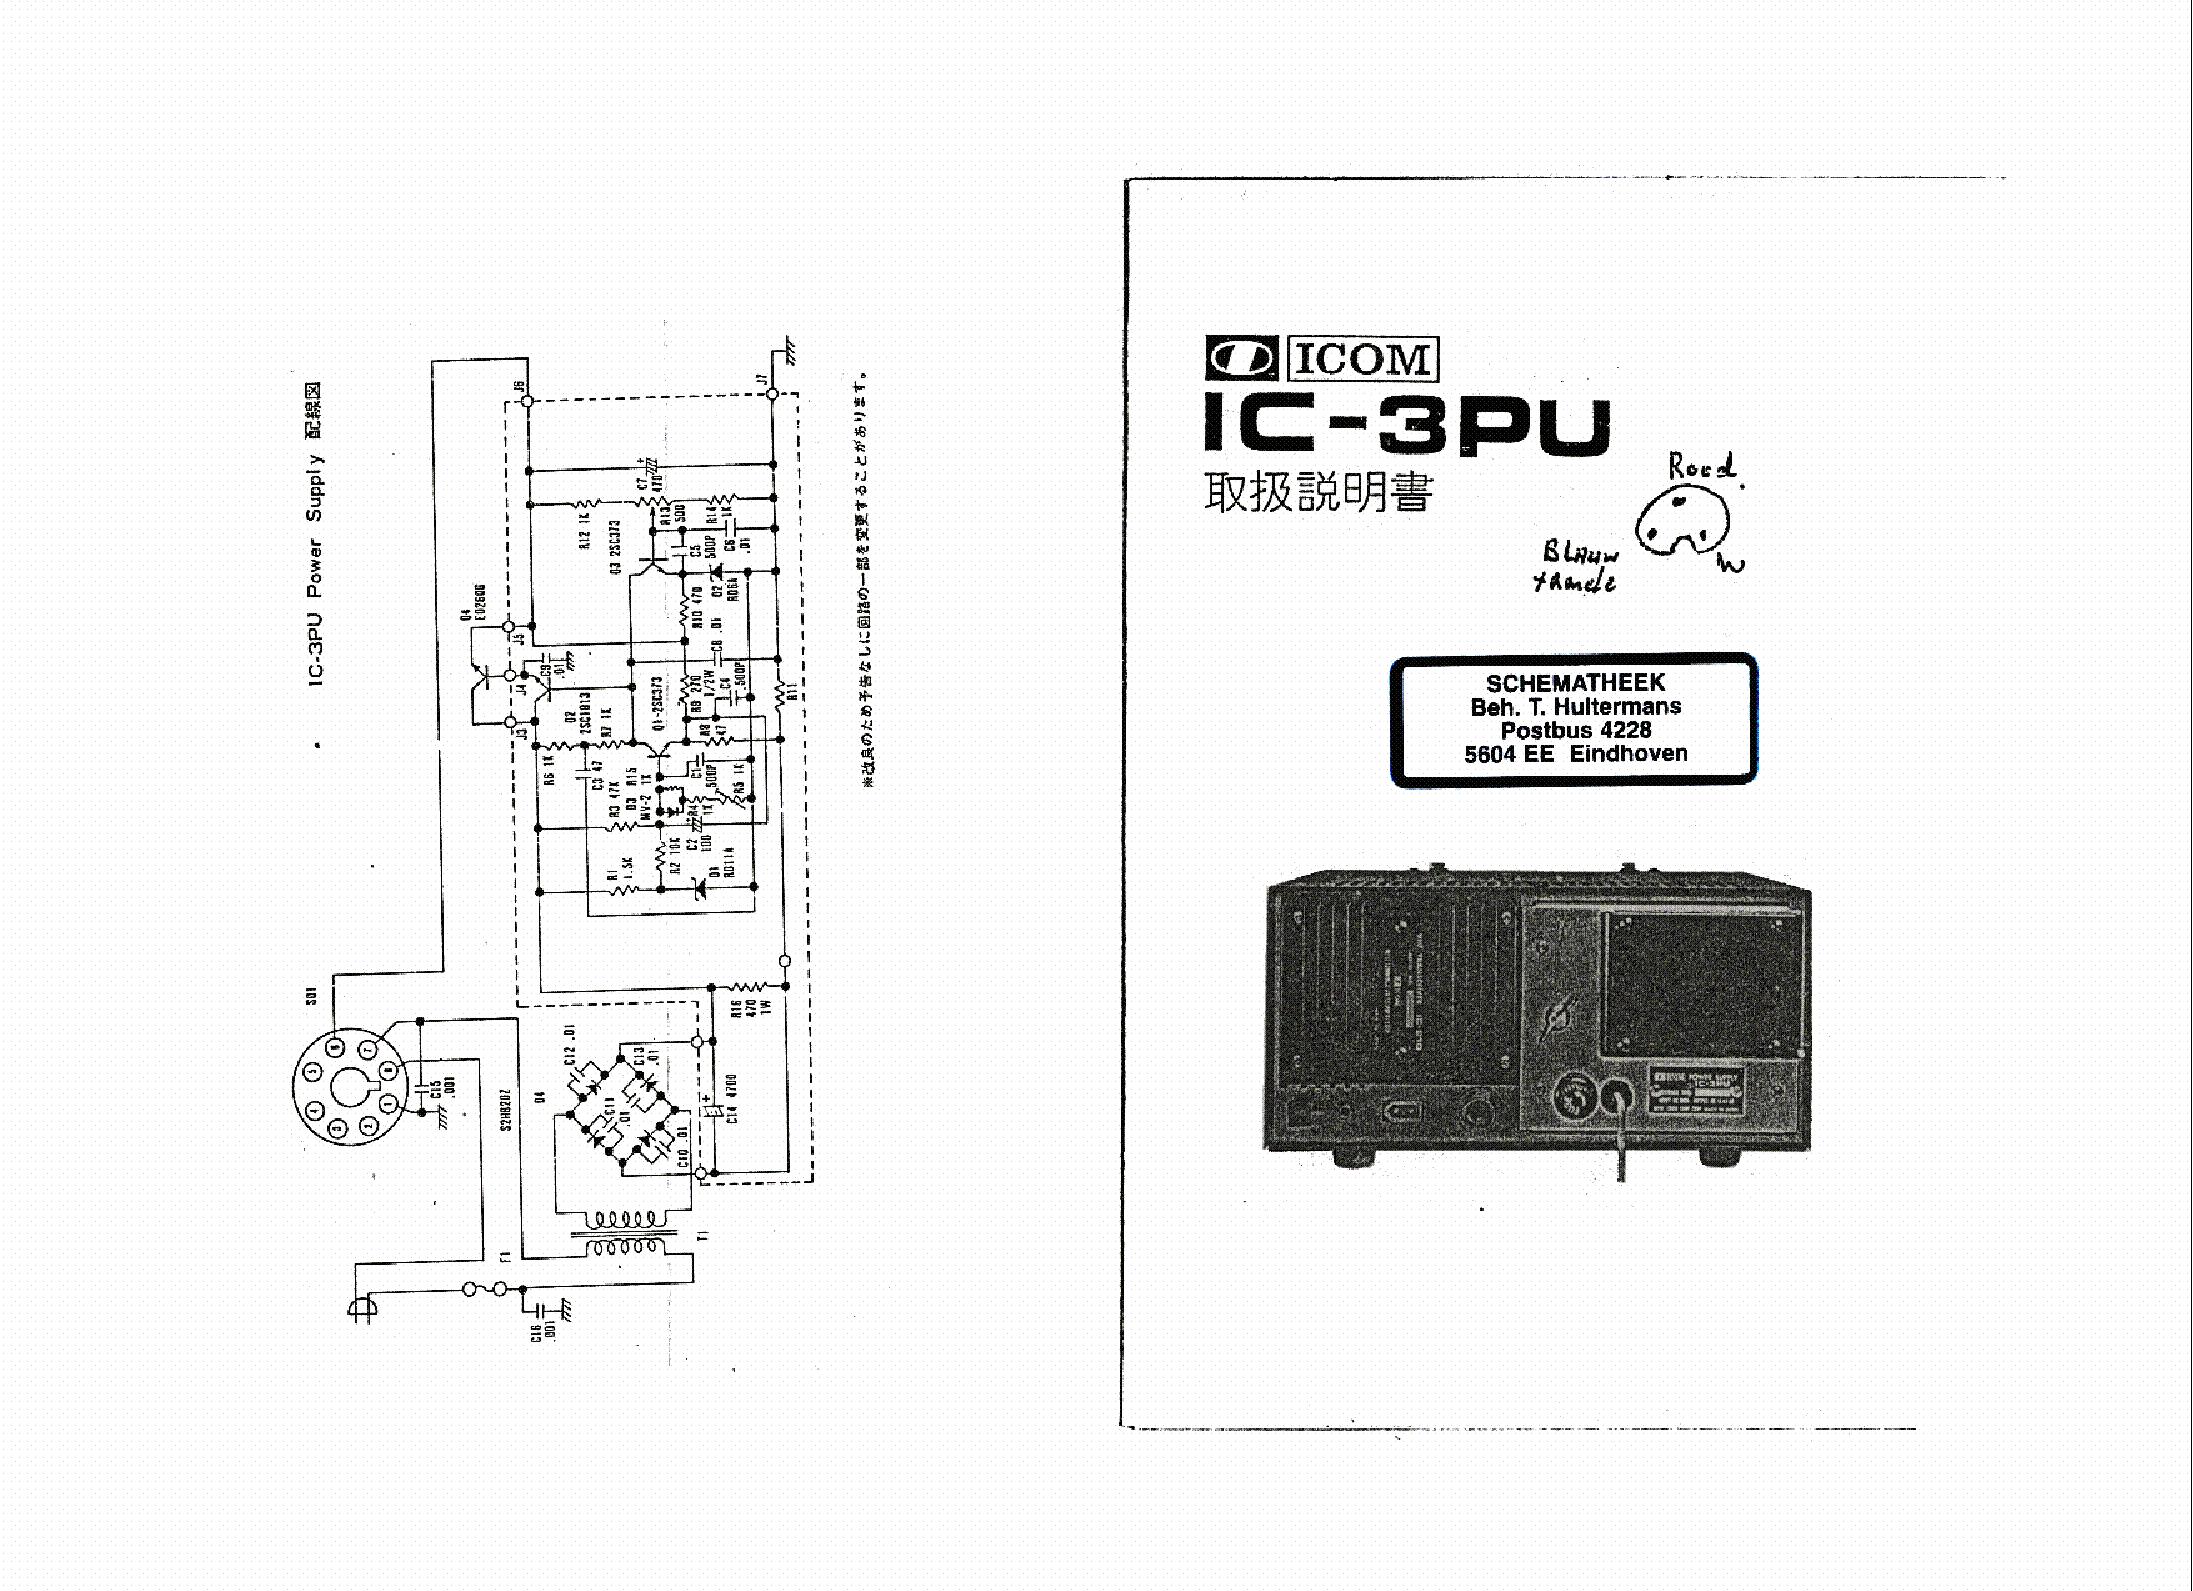 ICOM IC-3PU SCHEMATIC service manual (1st page)